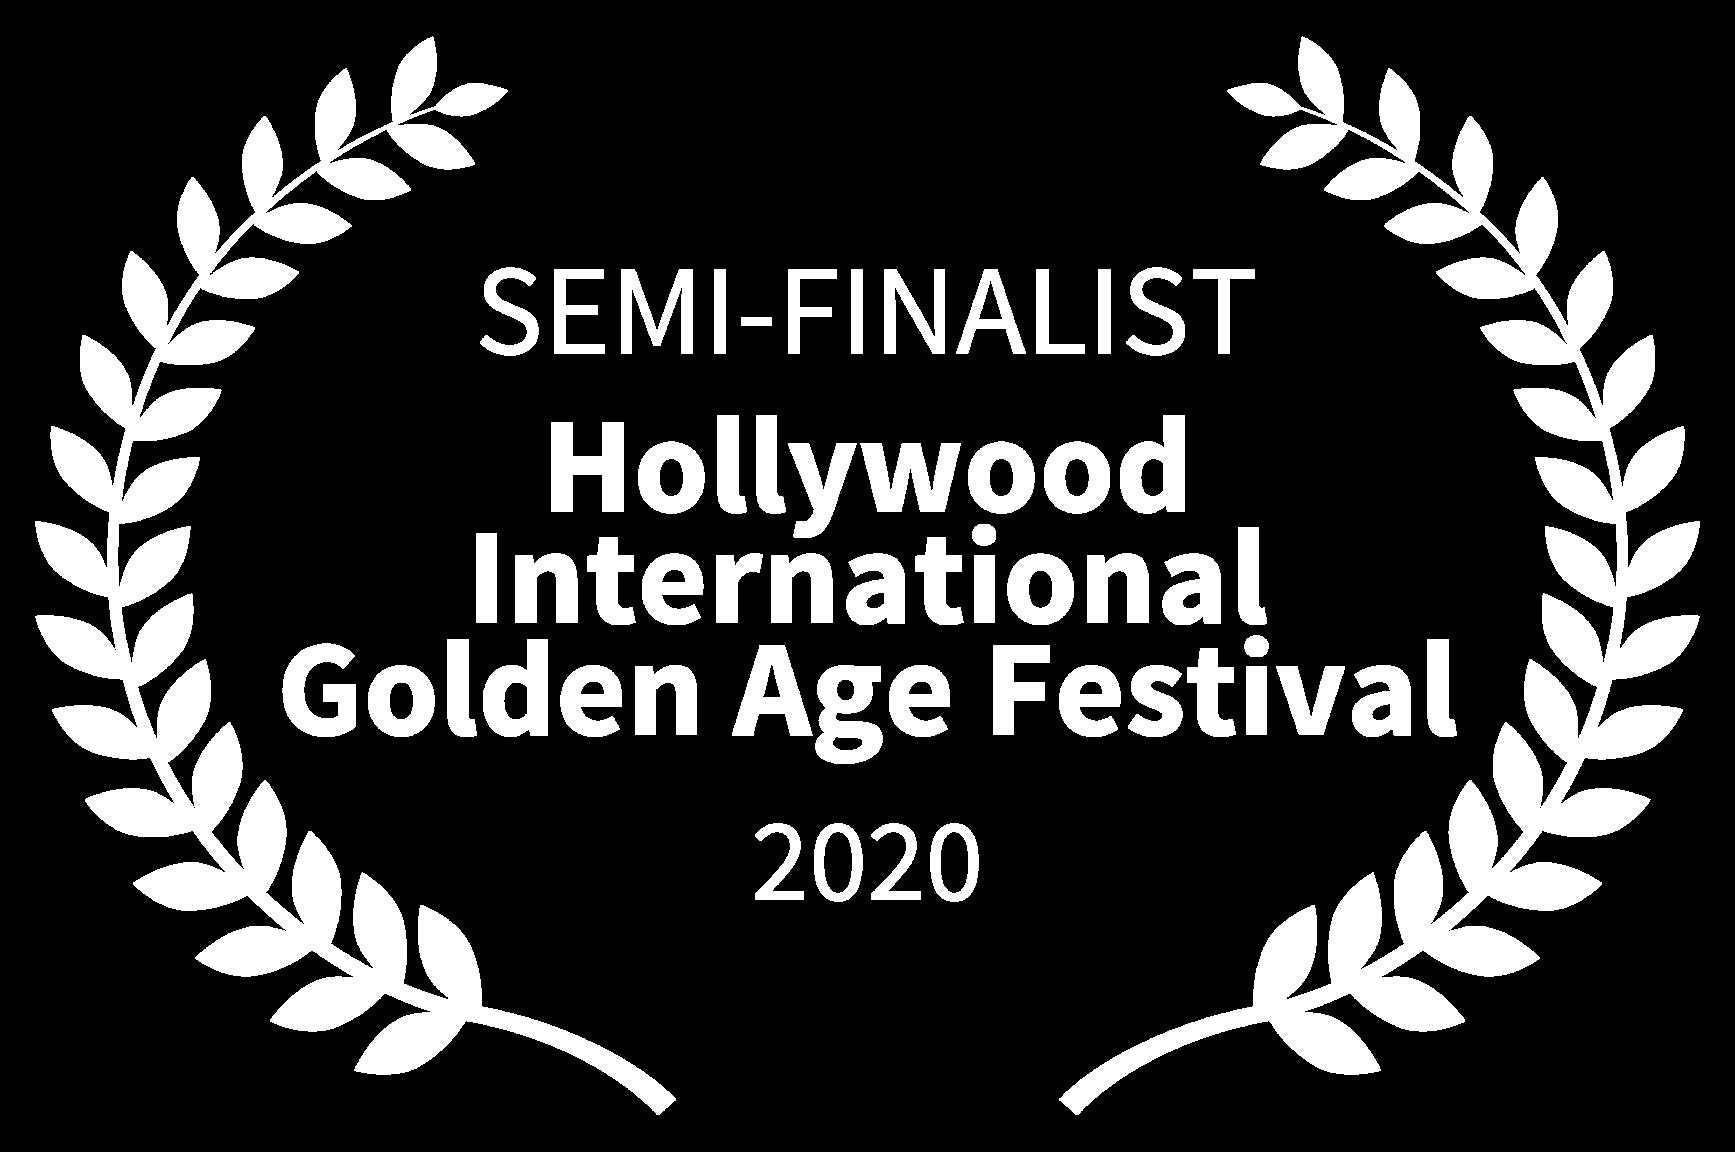 SEMI-FINALIST - Hollywood International Golden Age Festival - 2020